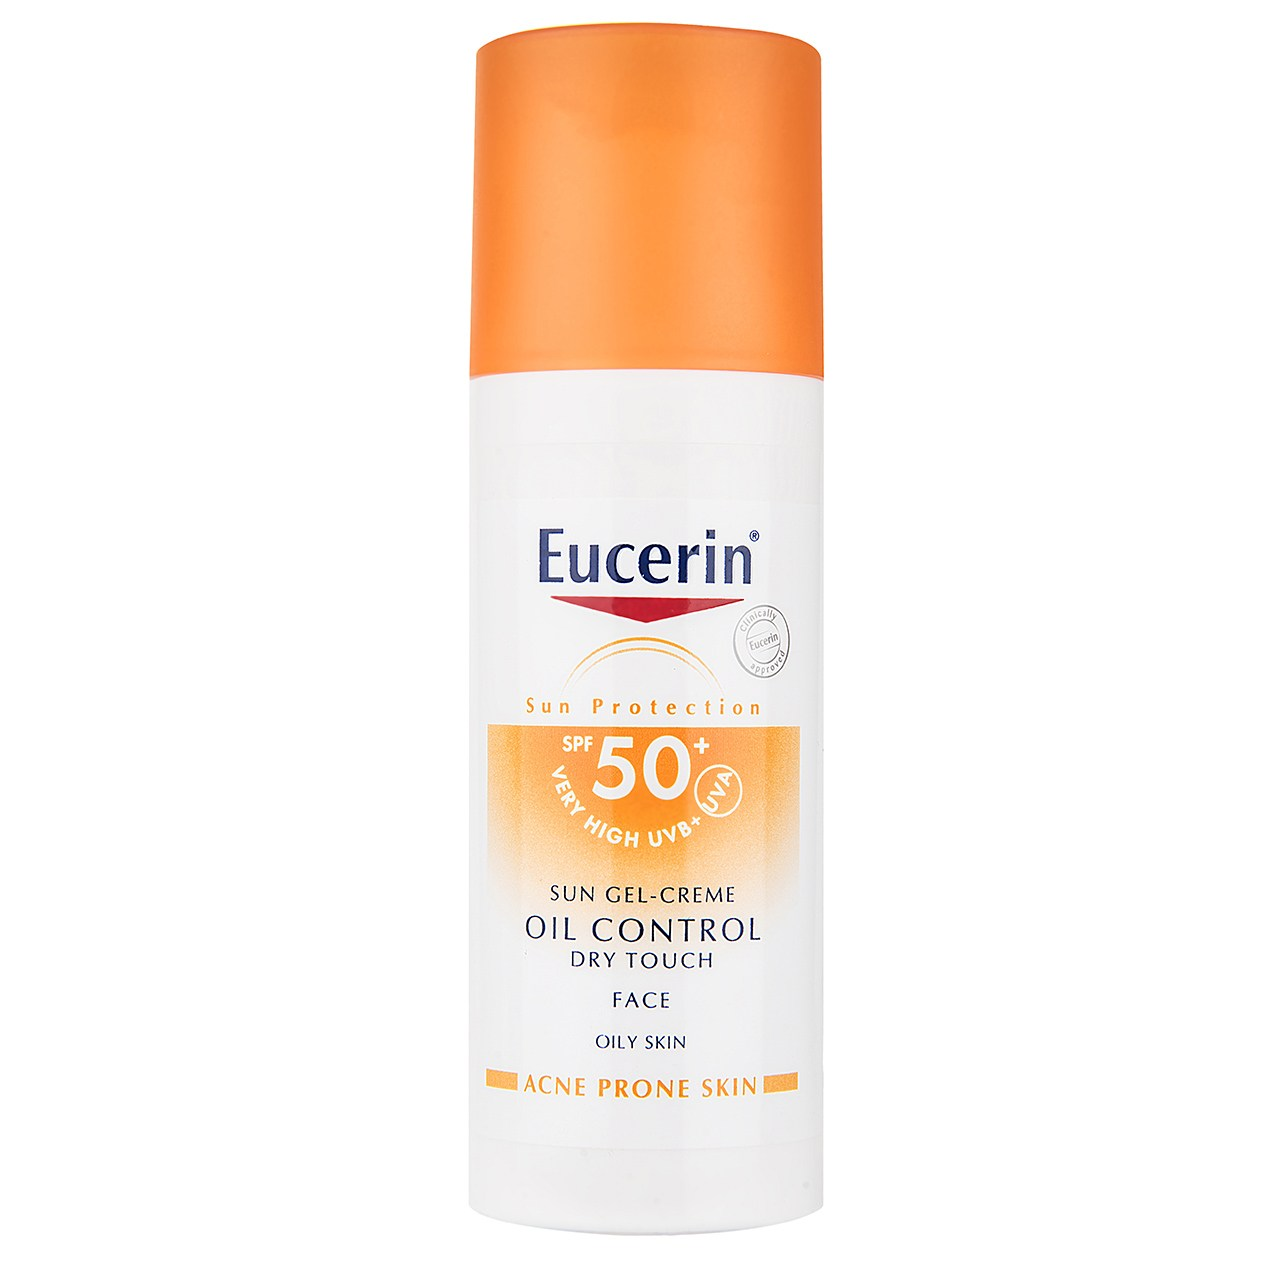 قیمت کرم ژل ضد آفتاب اوسرین سری Sun Protection Spf50 حجم 50 میلی لیتر